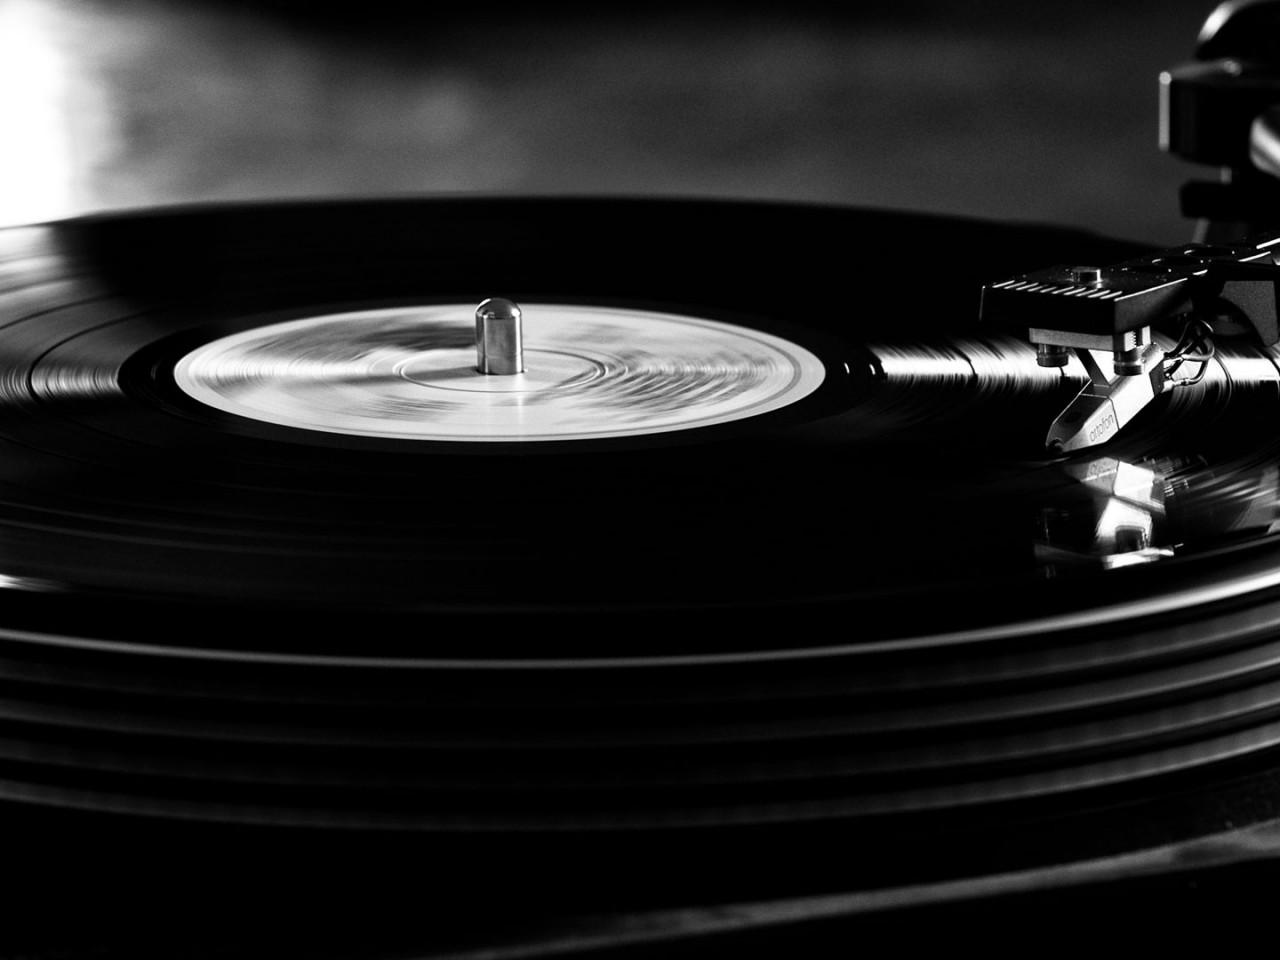 Vintage Vinyl Record Player Wallpaper Hd Wallpapers